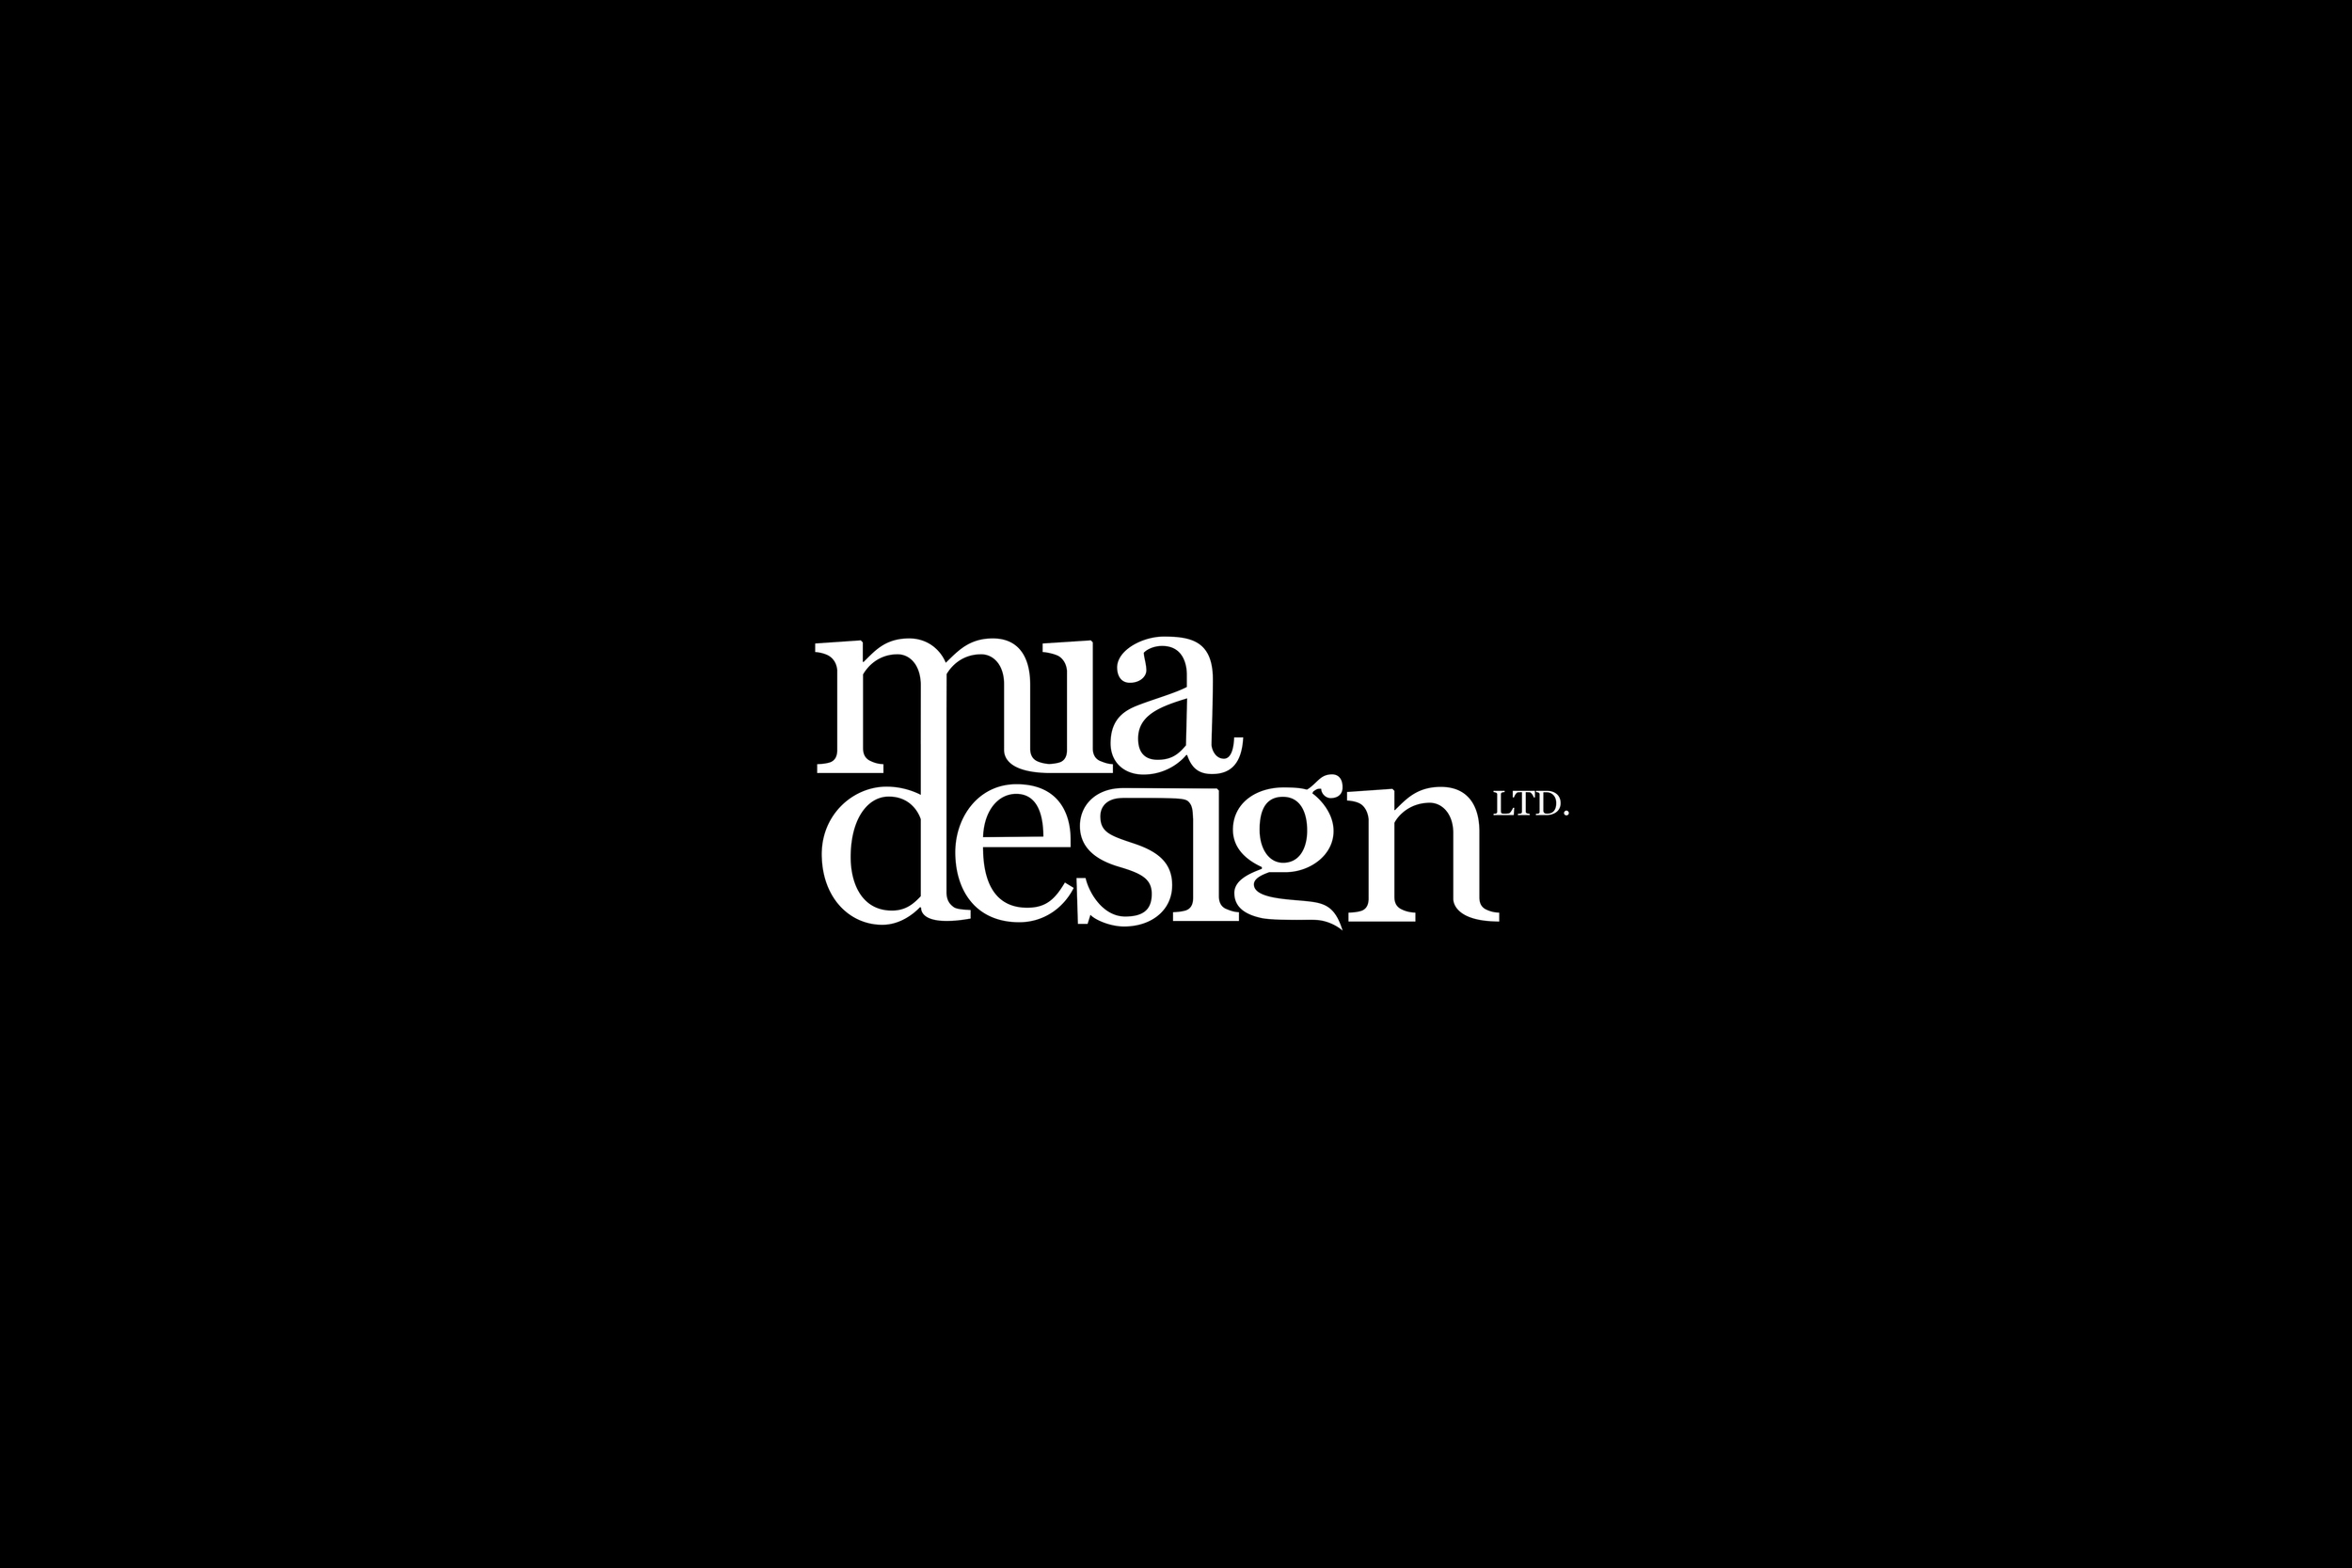 mia design.jpg